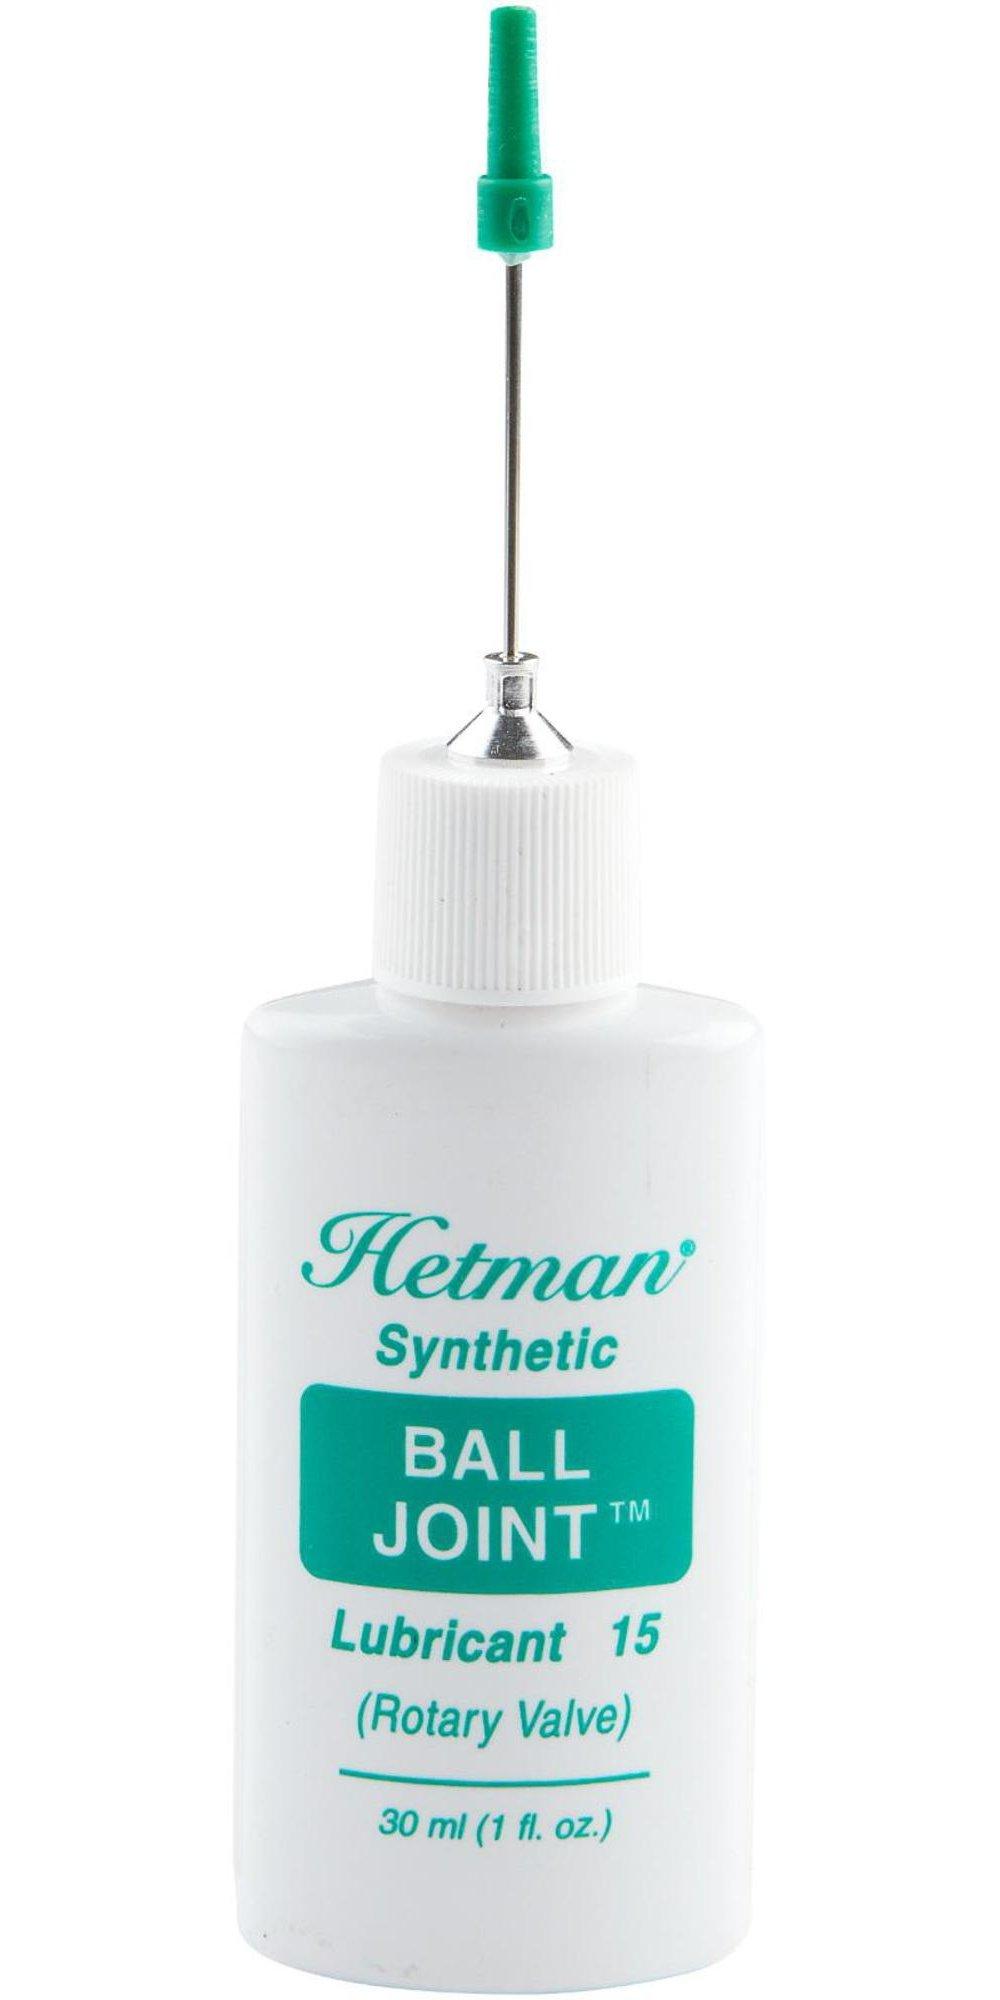 Hetman 15 - Ball Joint Lubricant